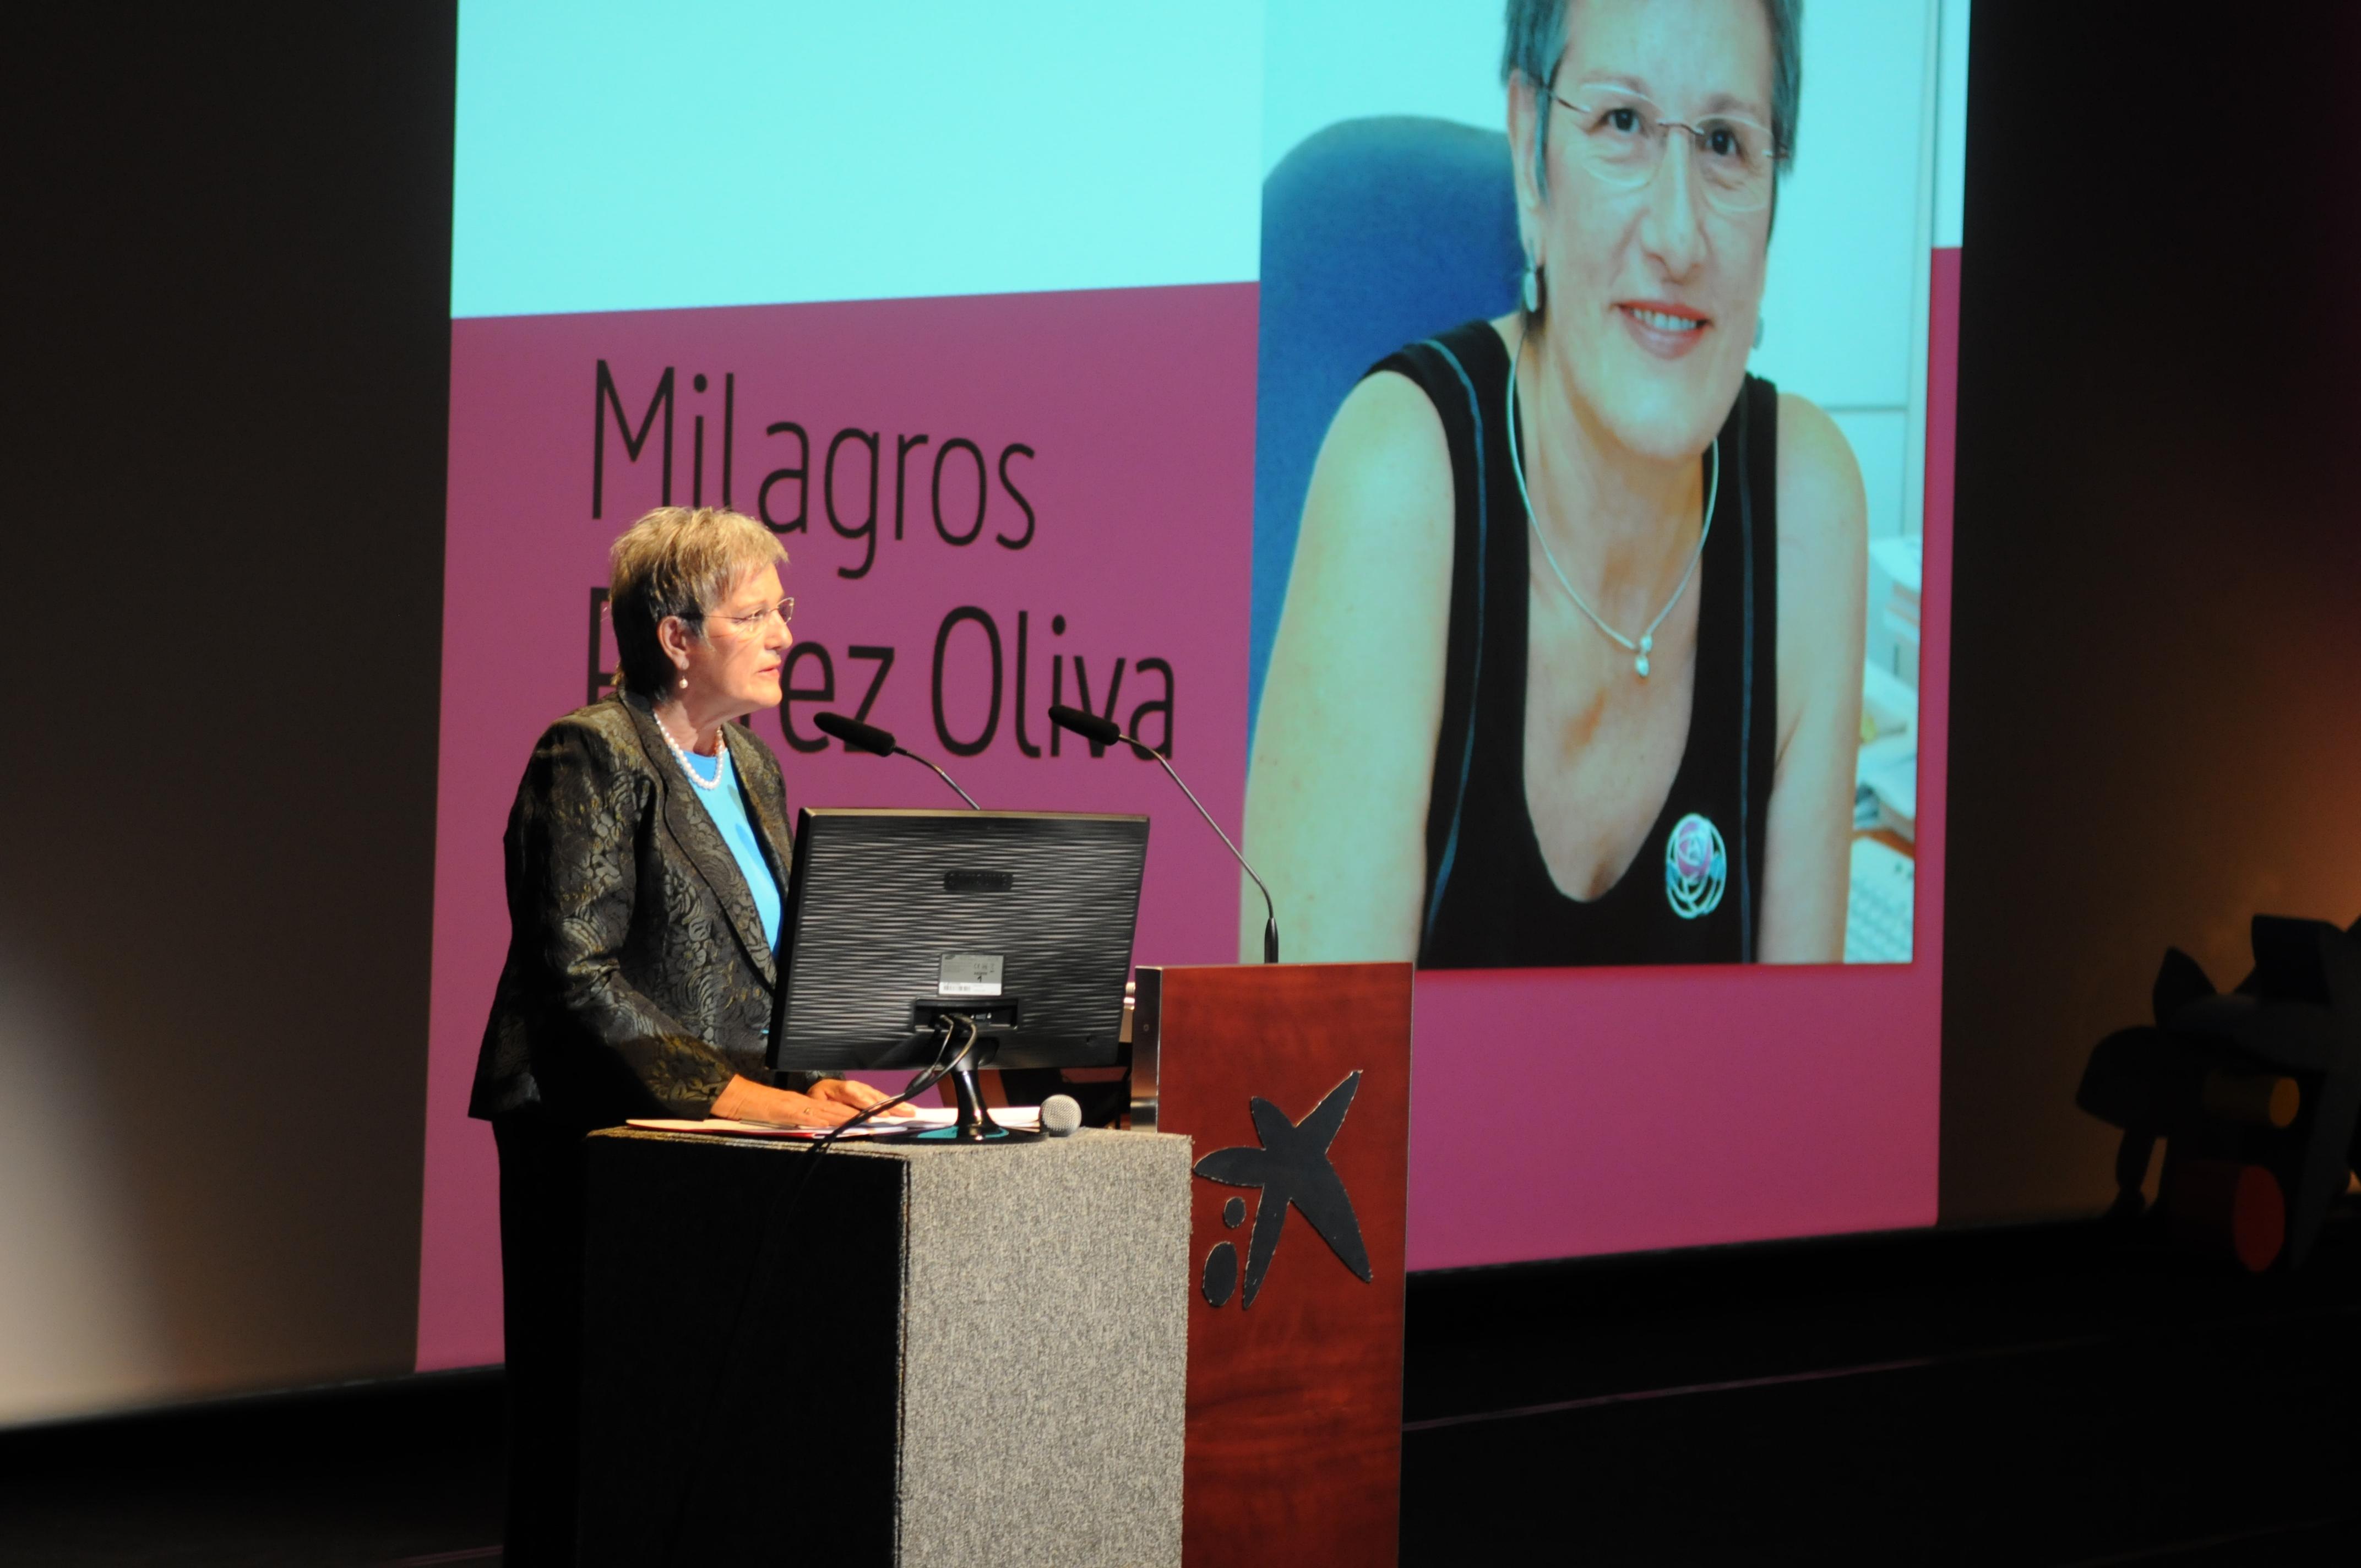 Milagros Perez Oliva Premi - Report.cat